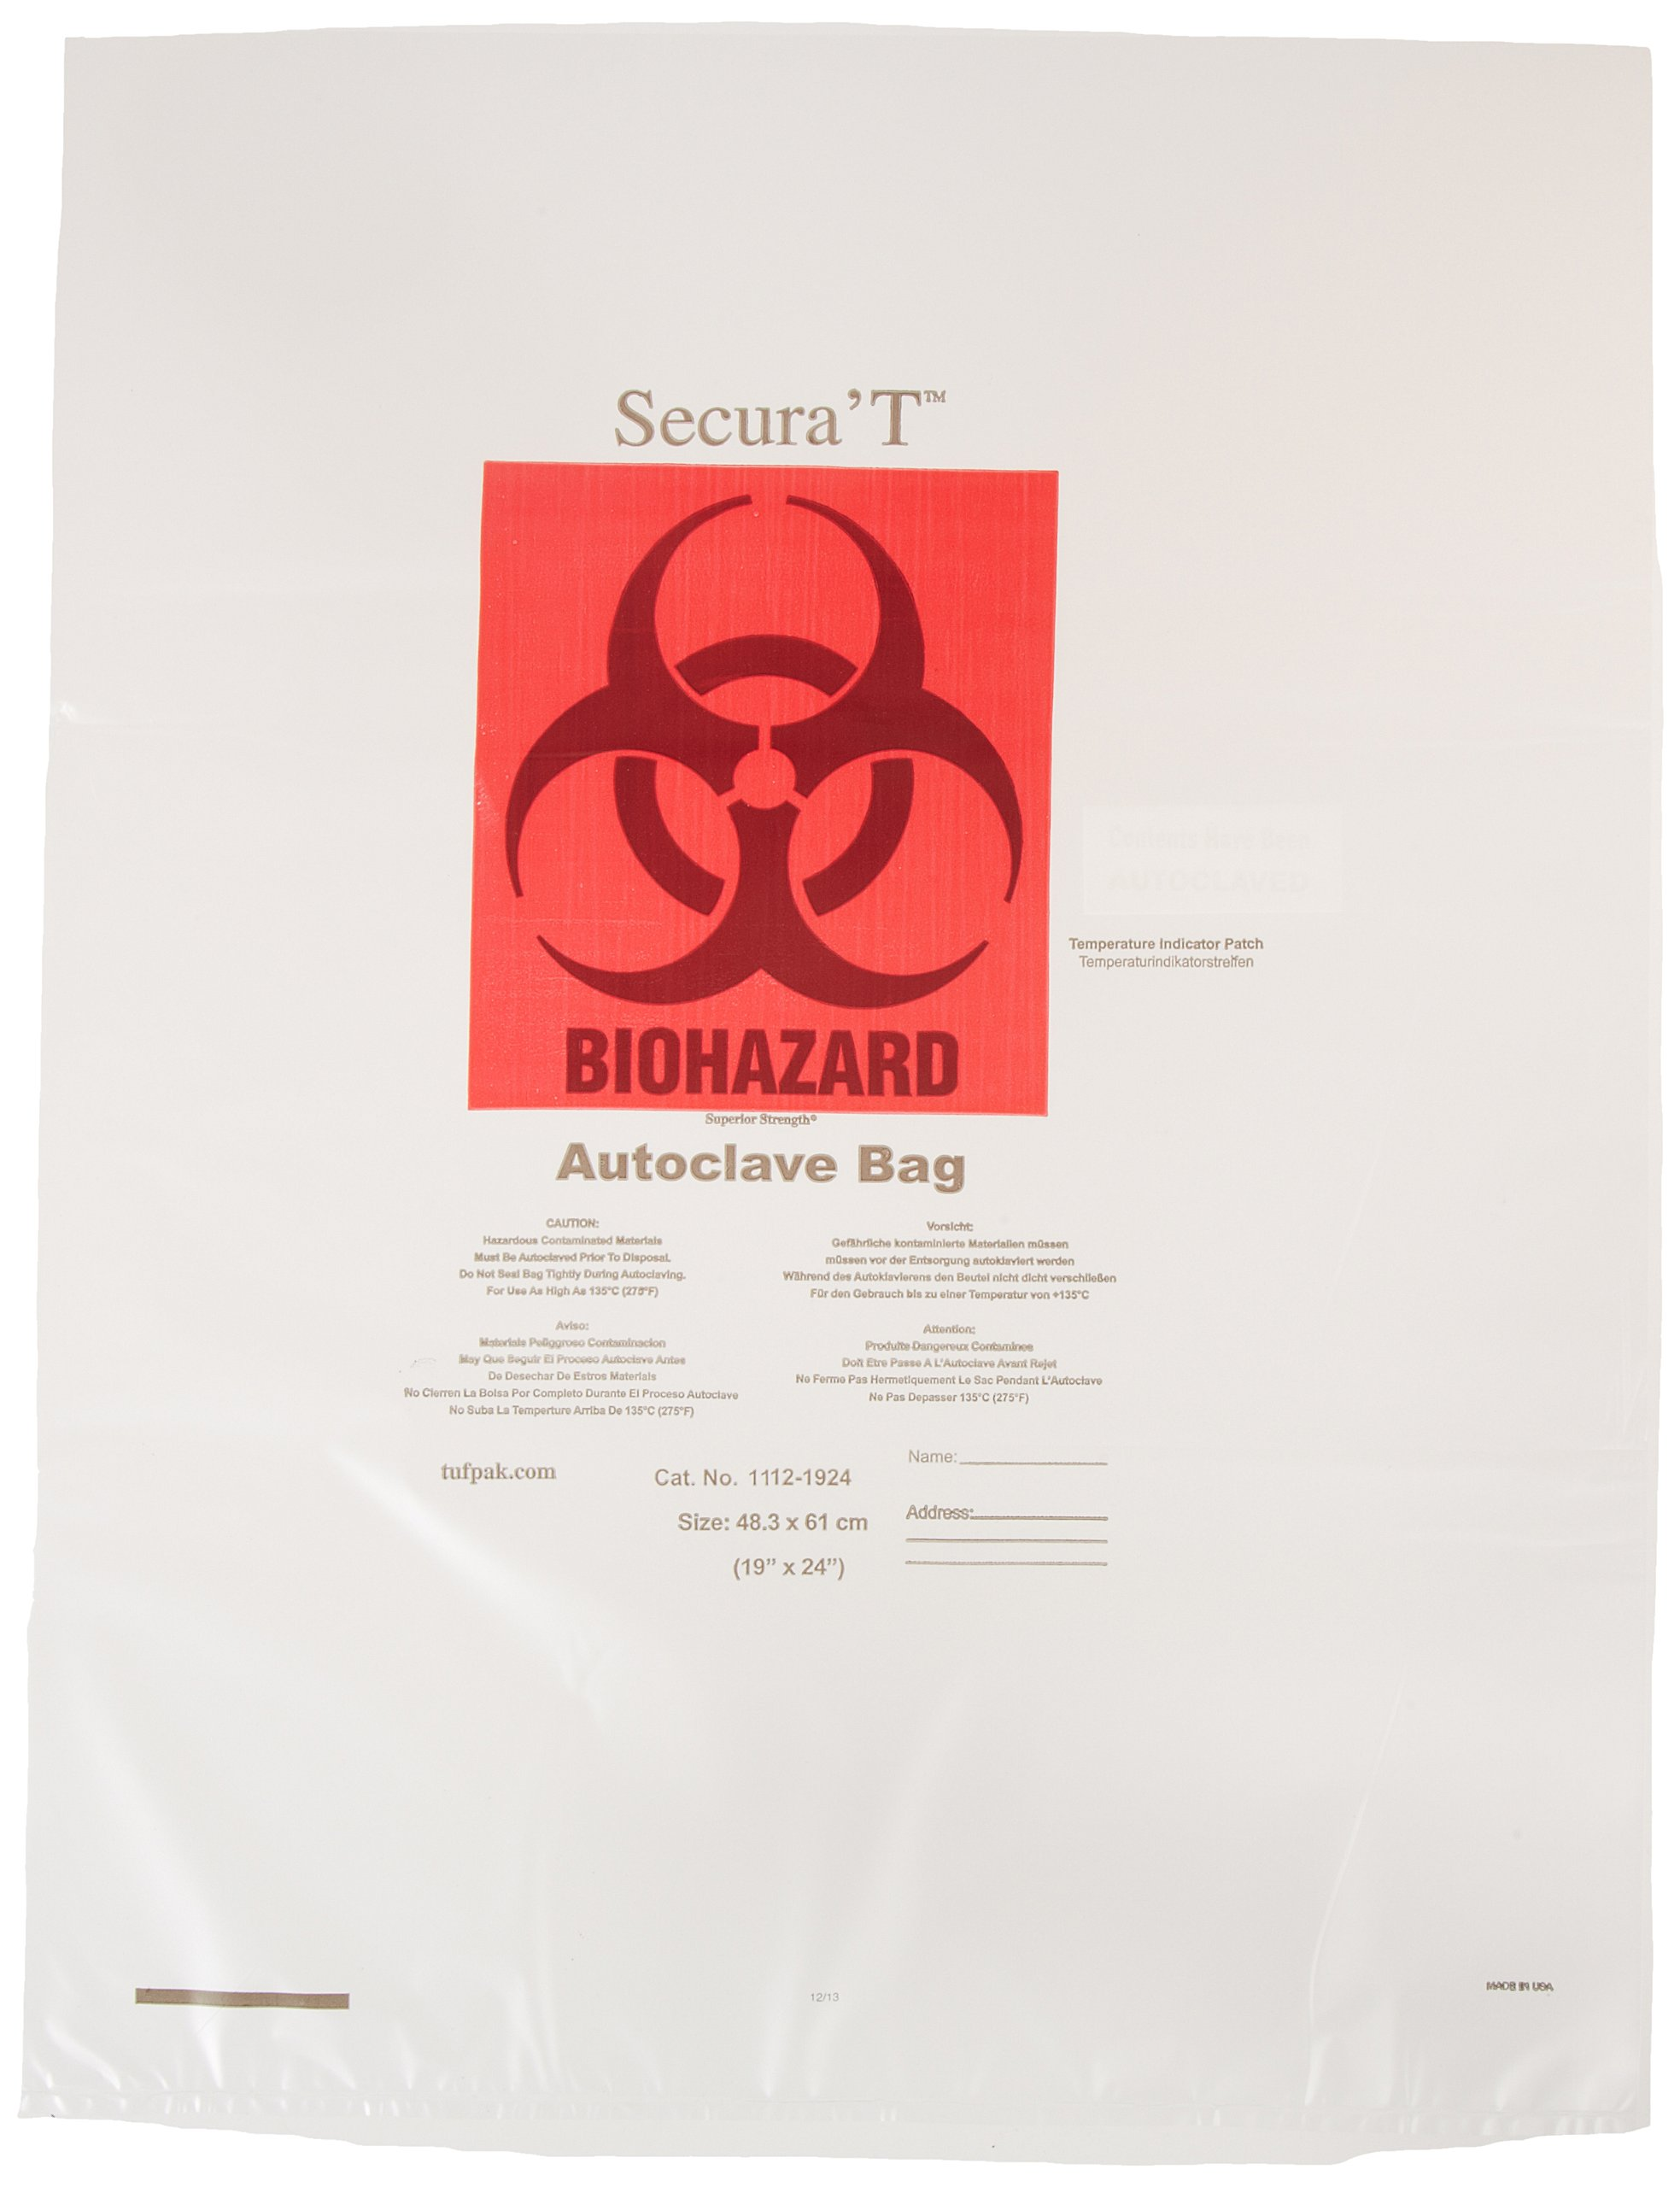 Tufpak 1112-2430 Polypropylene Autoclavable Biohazard Bag, Clear, 24'' W x 30'' H (Case of 200)